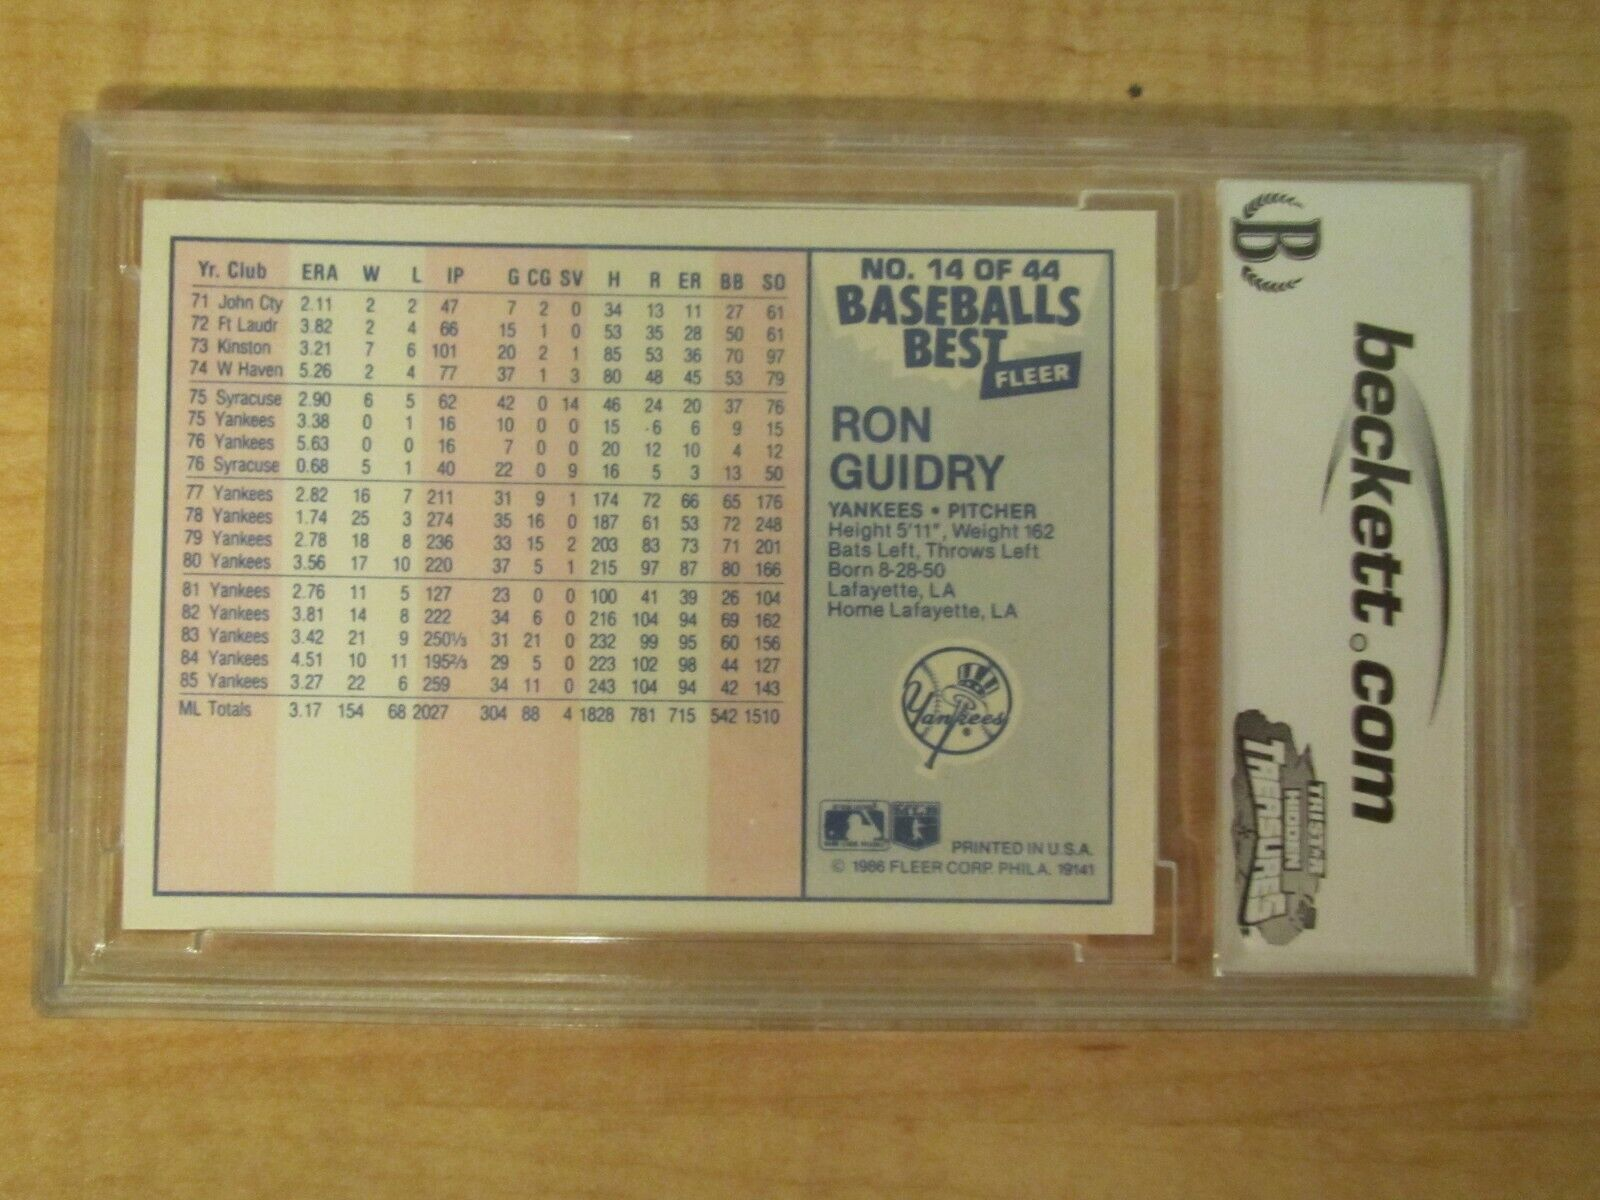 1986 Fleer Sluggers/Pitchers Baseball Ron Guidry 14 Of 44 BGS BCCG 10 Mint  - $24.99